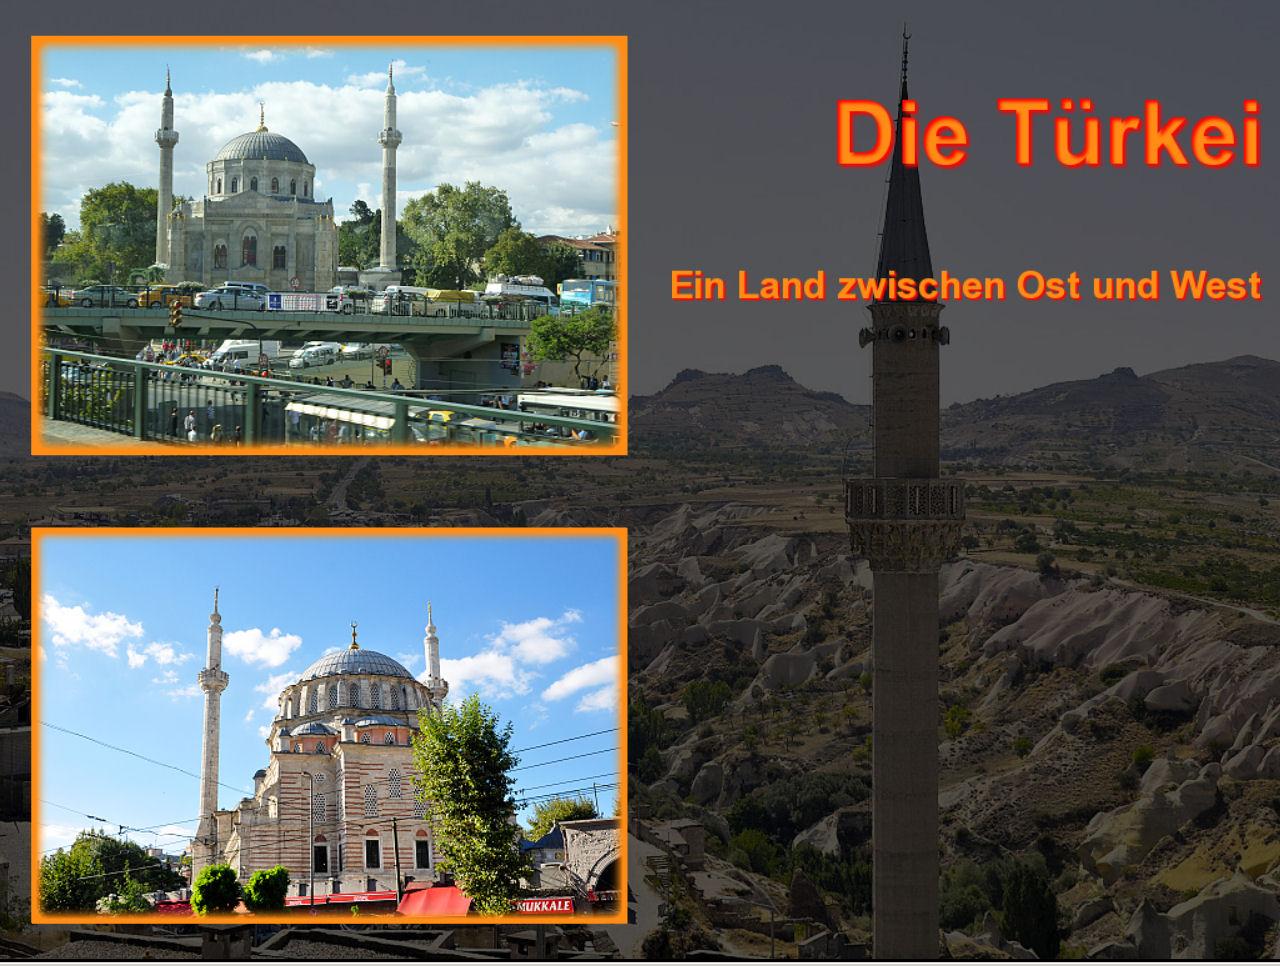 Multimediaschau Türkei